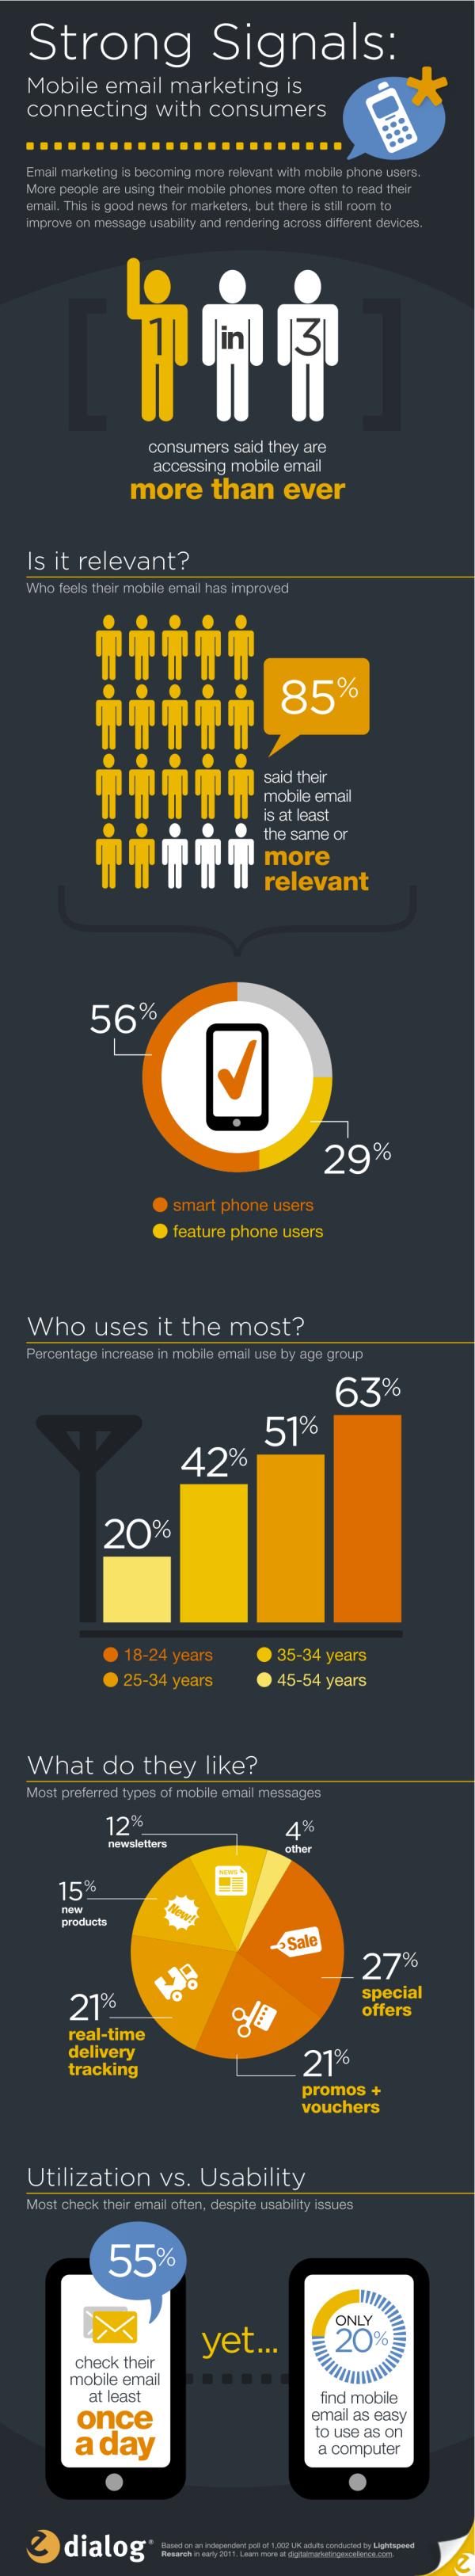 Mobile Email Marketing resized 600